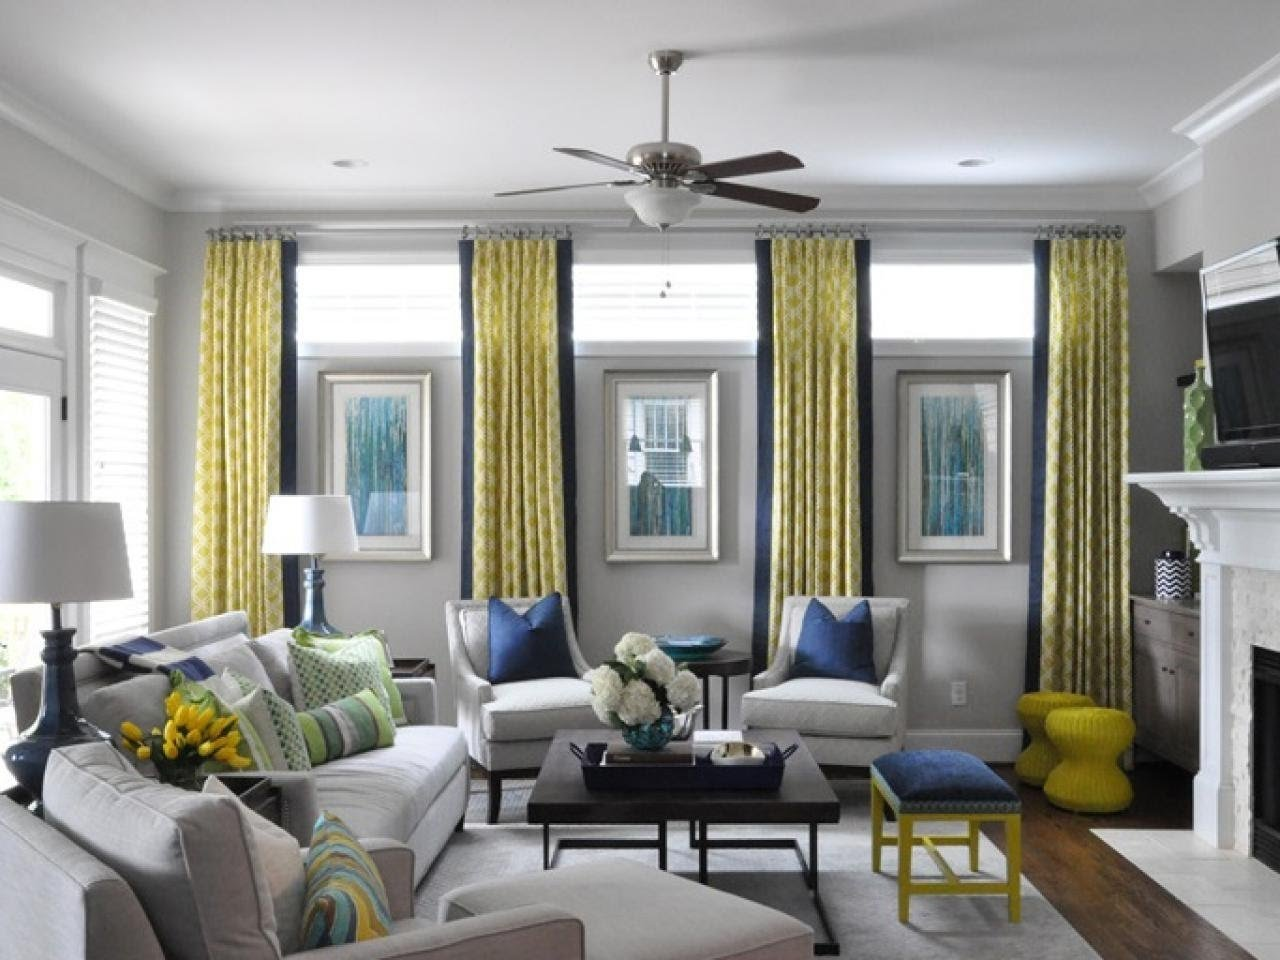 10 Cute Windows Treatment Ideas For Living Room awesome window treatment ideas for living room youtube 1